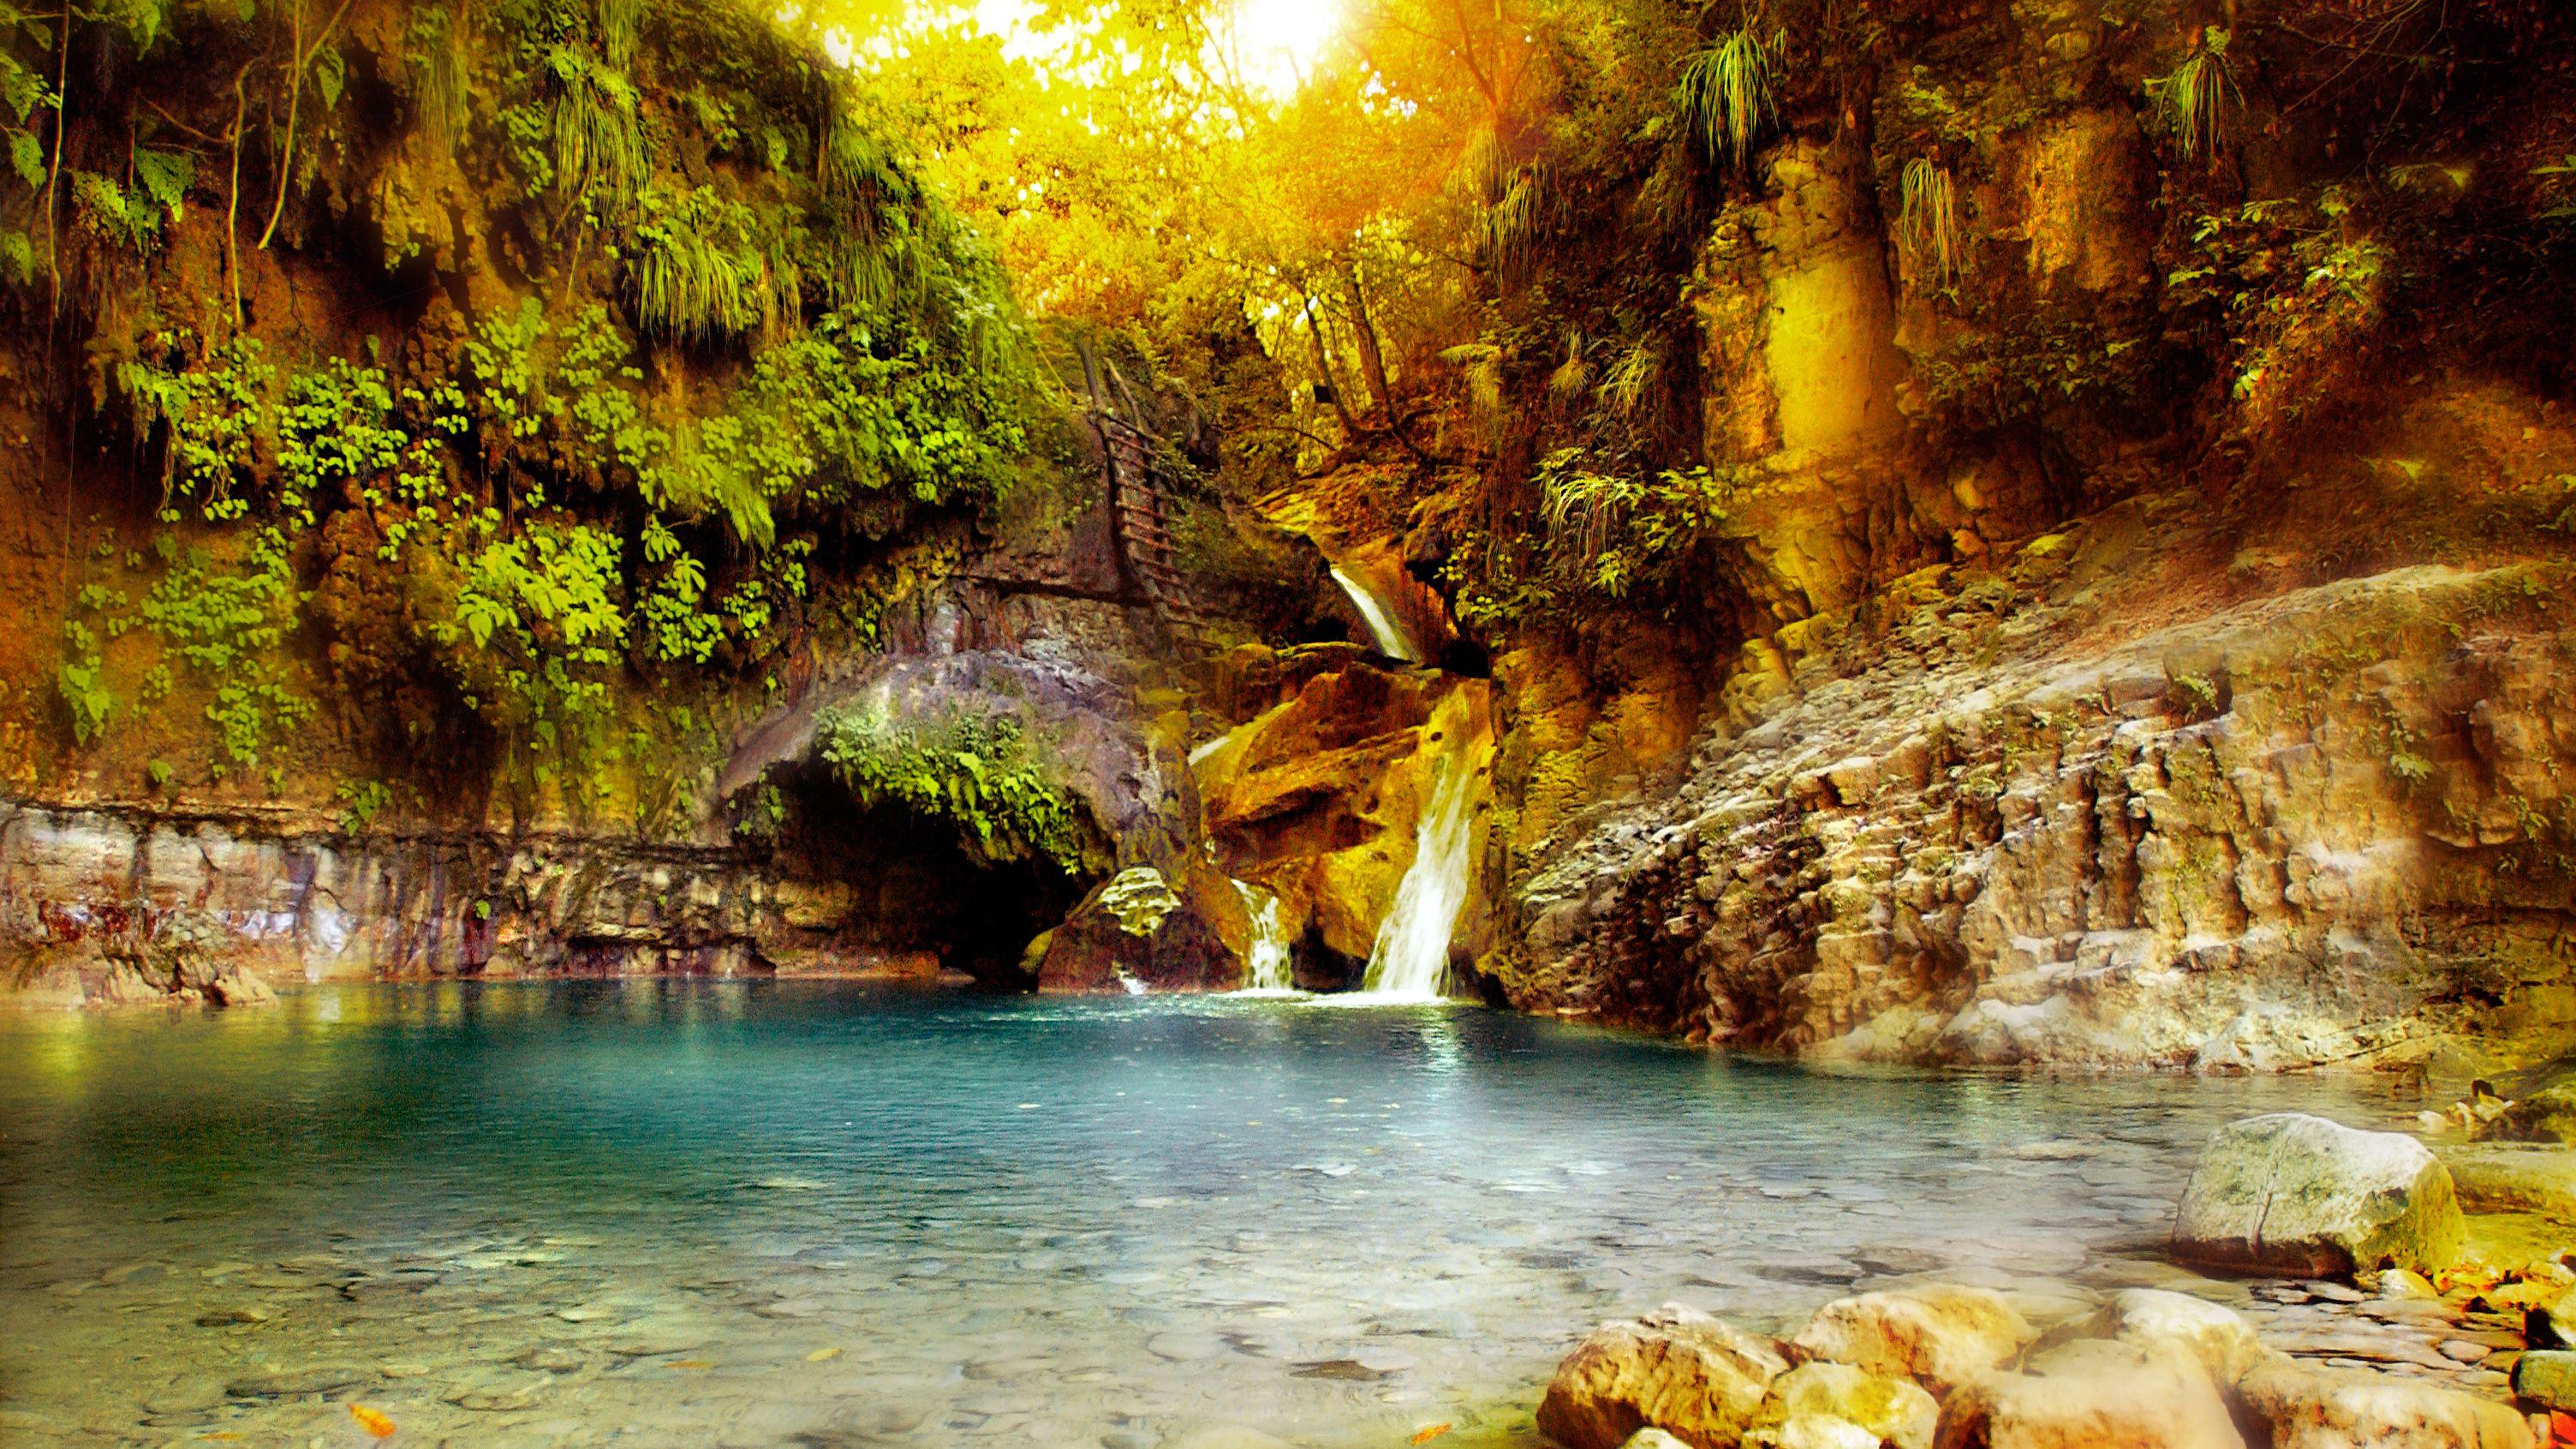 Waterfall into sun splashed clear pool